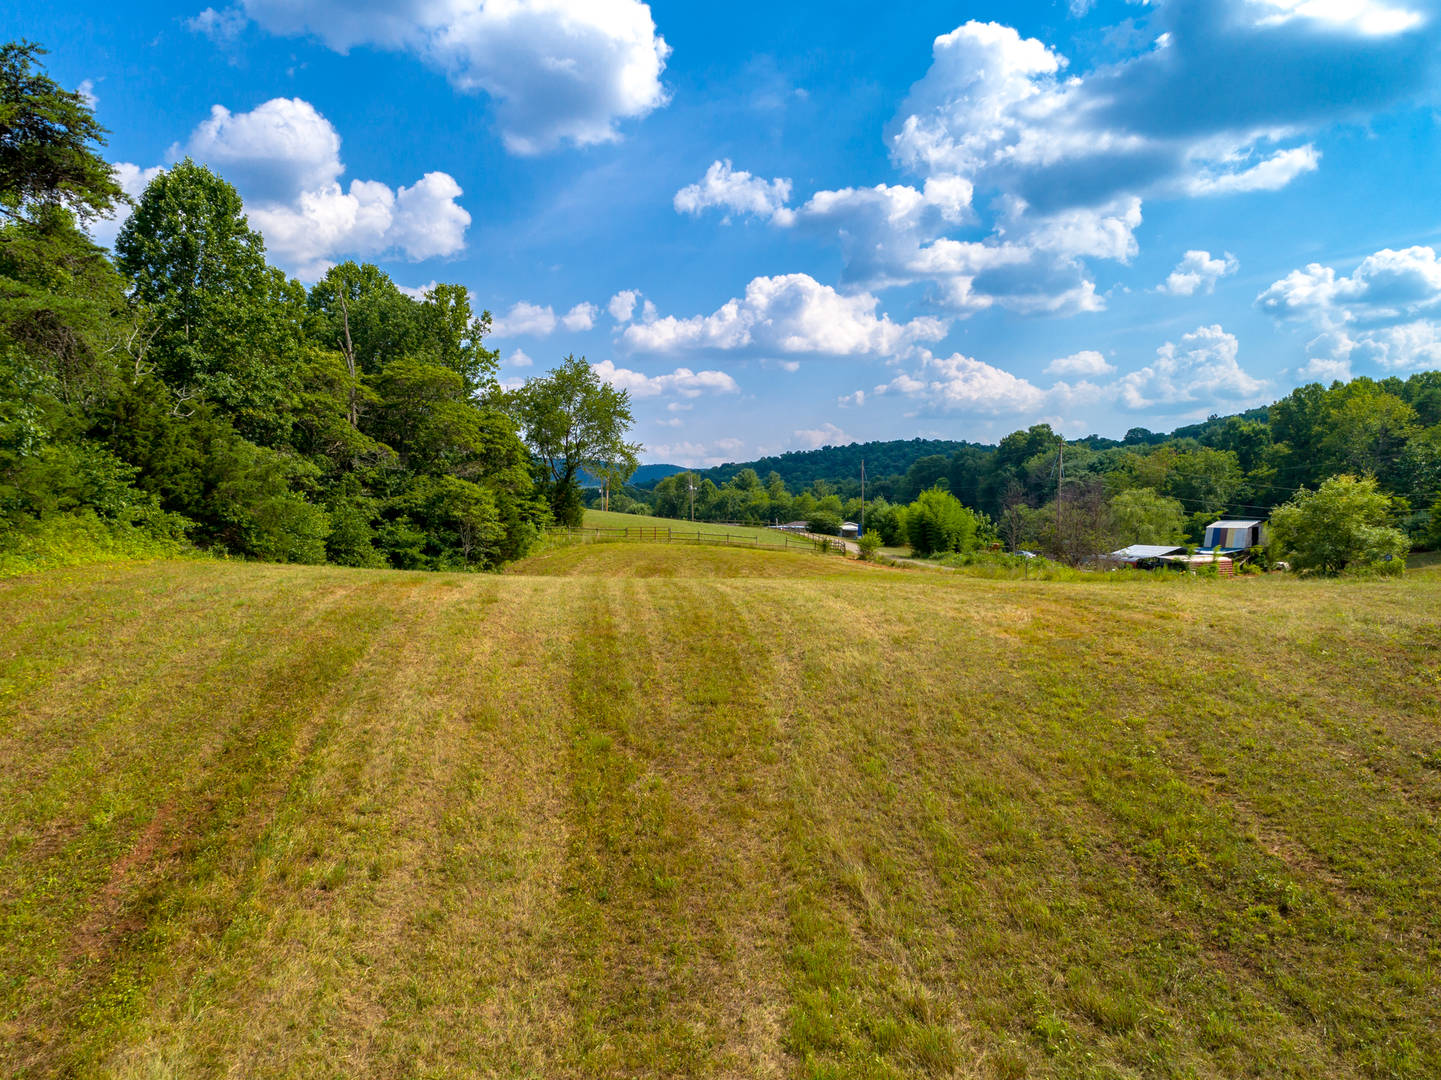 Lot 12 - Lone Ash Rd & Bald Meadow Ln Barren Springs, VA 24313